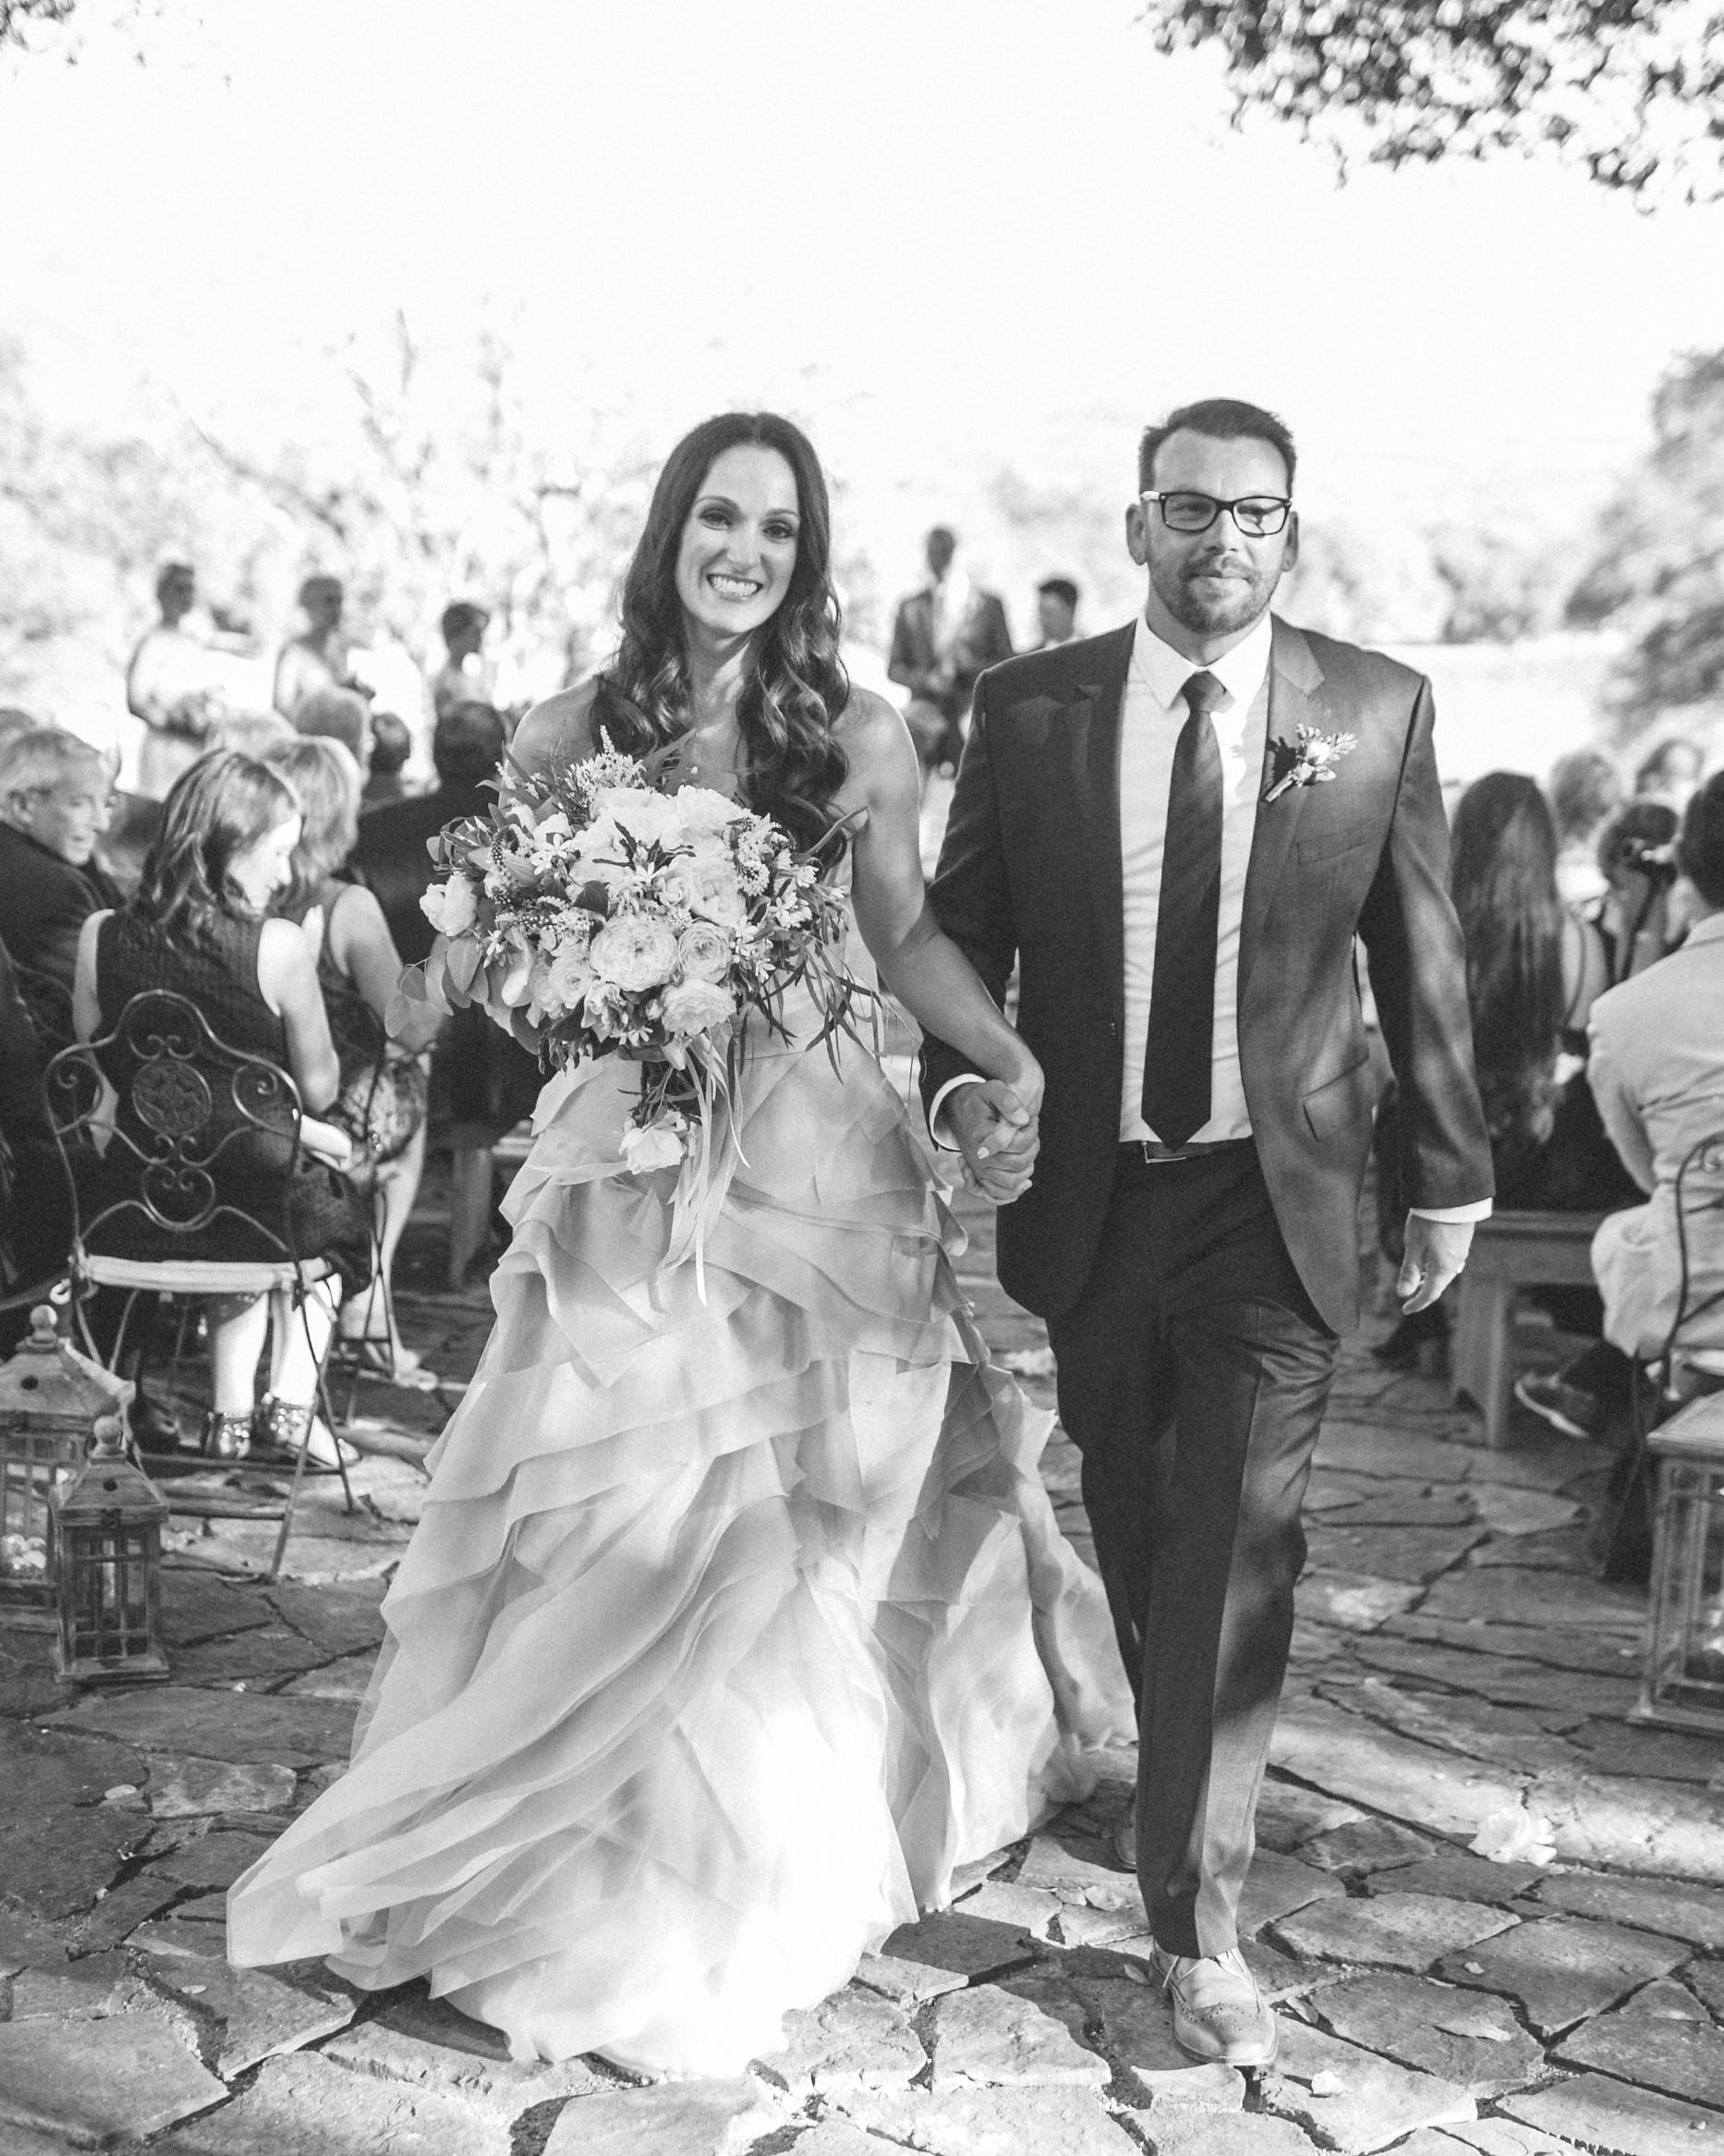 briana-adam-wedding-couple-0870-s112471-1215.jpg